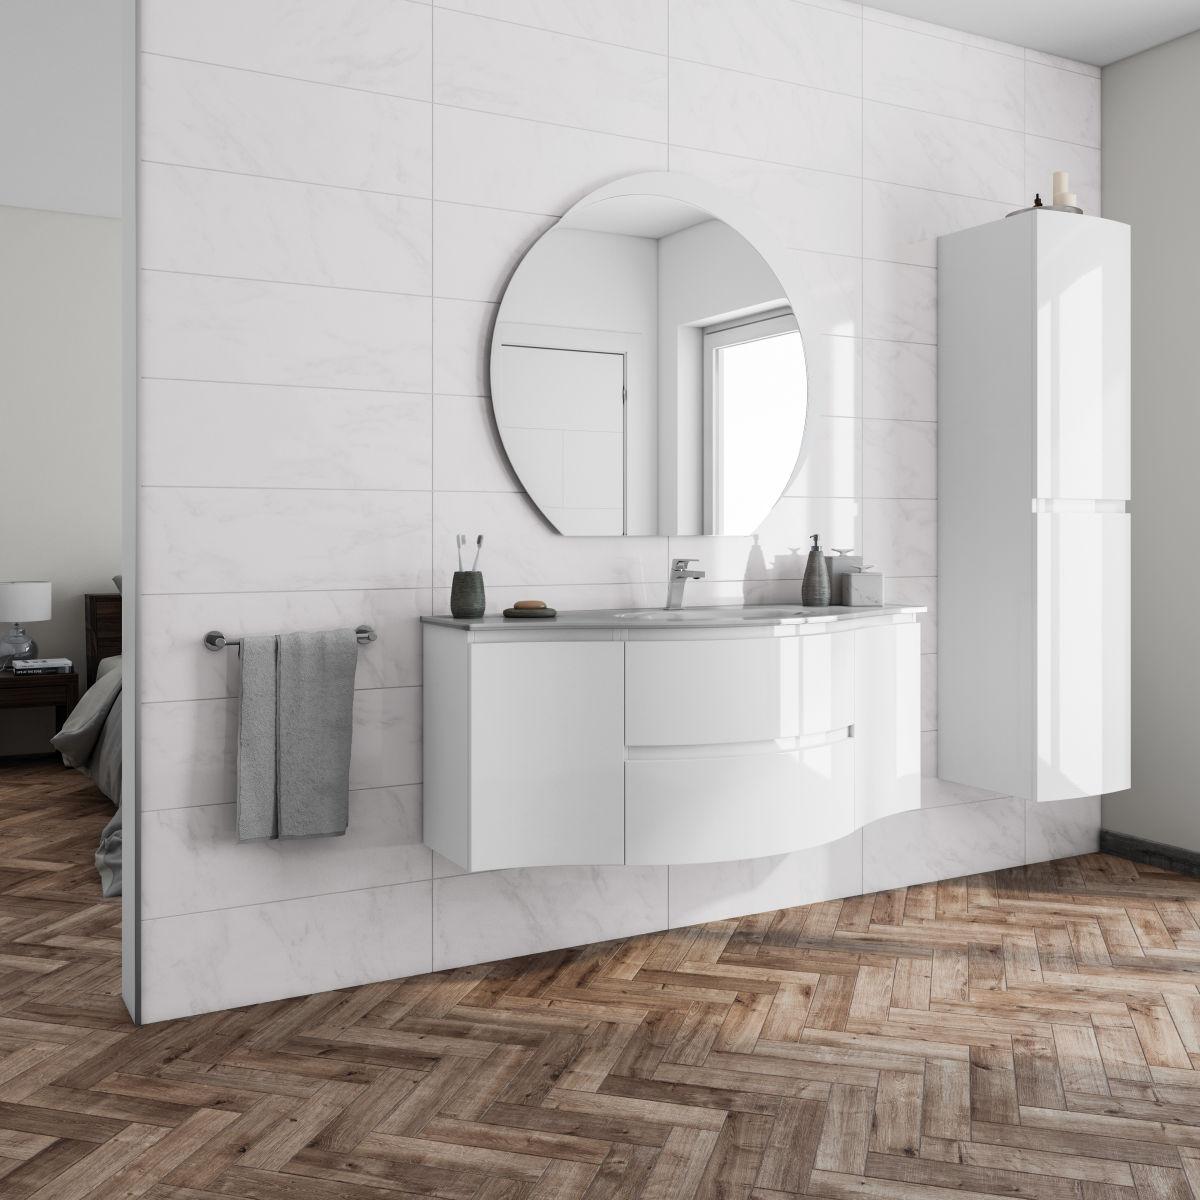 Stunning mobili lavandino bagno images acrylicgiftware - Offerte mobili da bagno ...